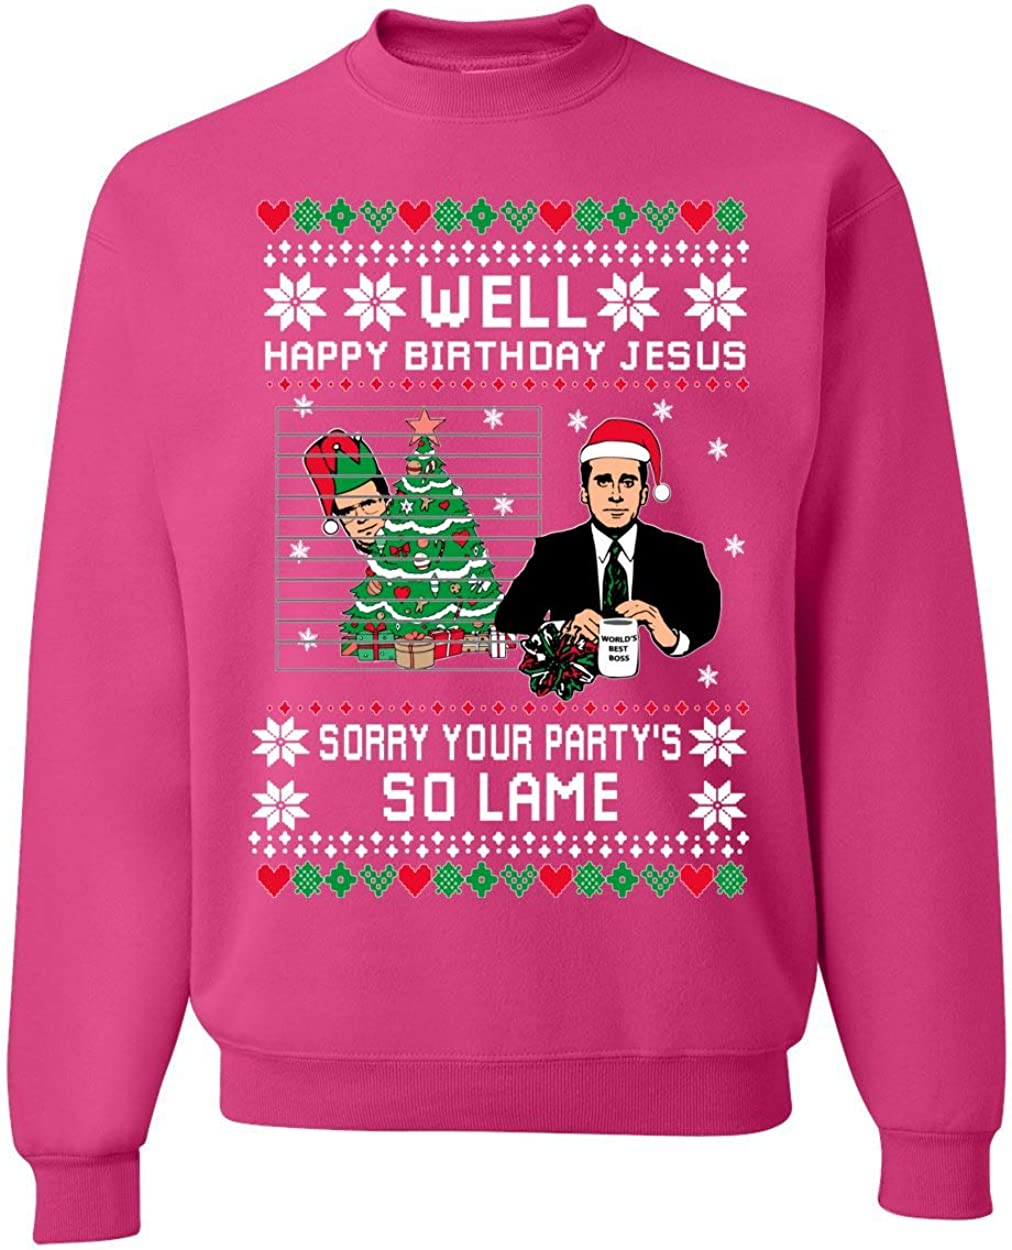 Well Happy Birthday Jesus Funny Quote Office   Unisex Ugly Christmas Sweater Crewneck Sweatshirt